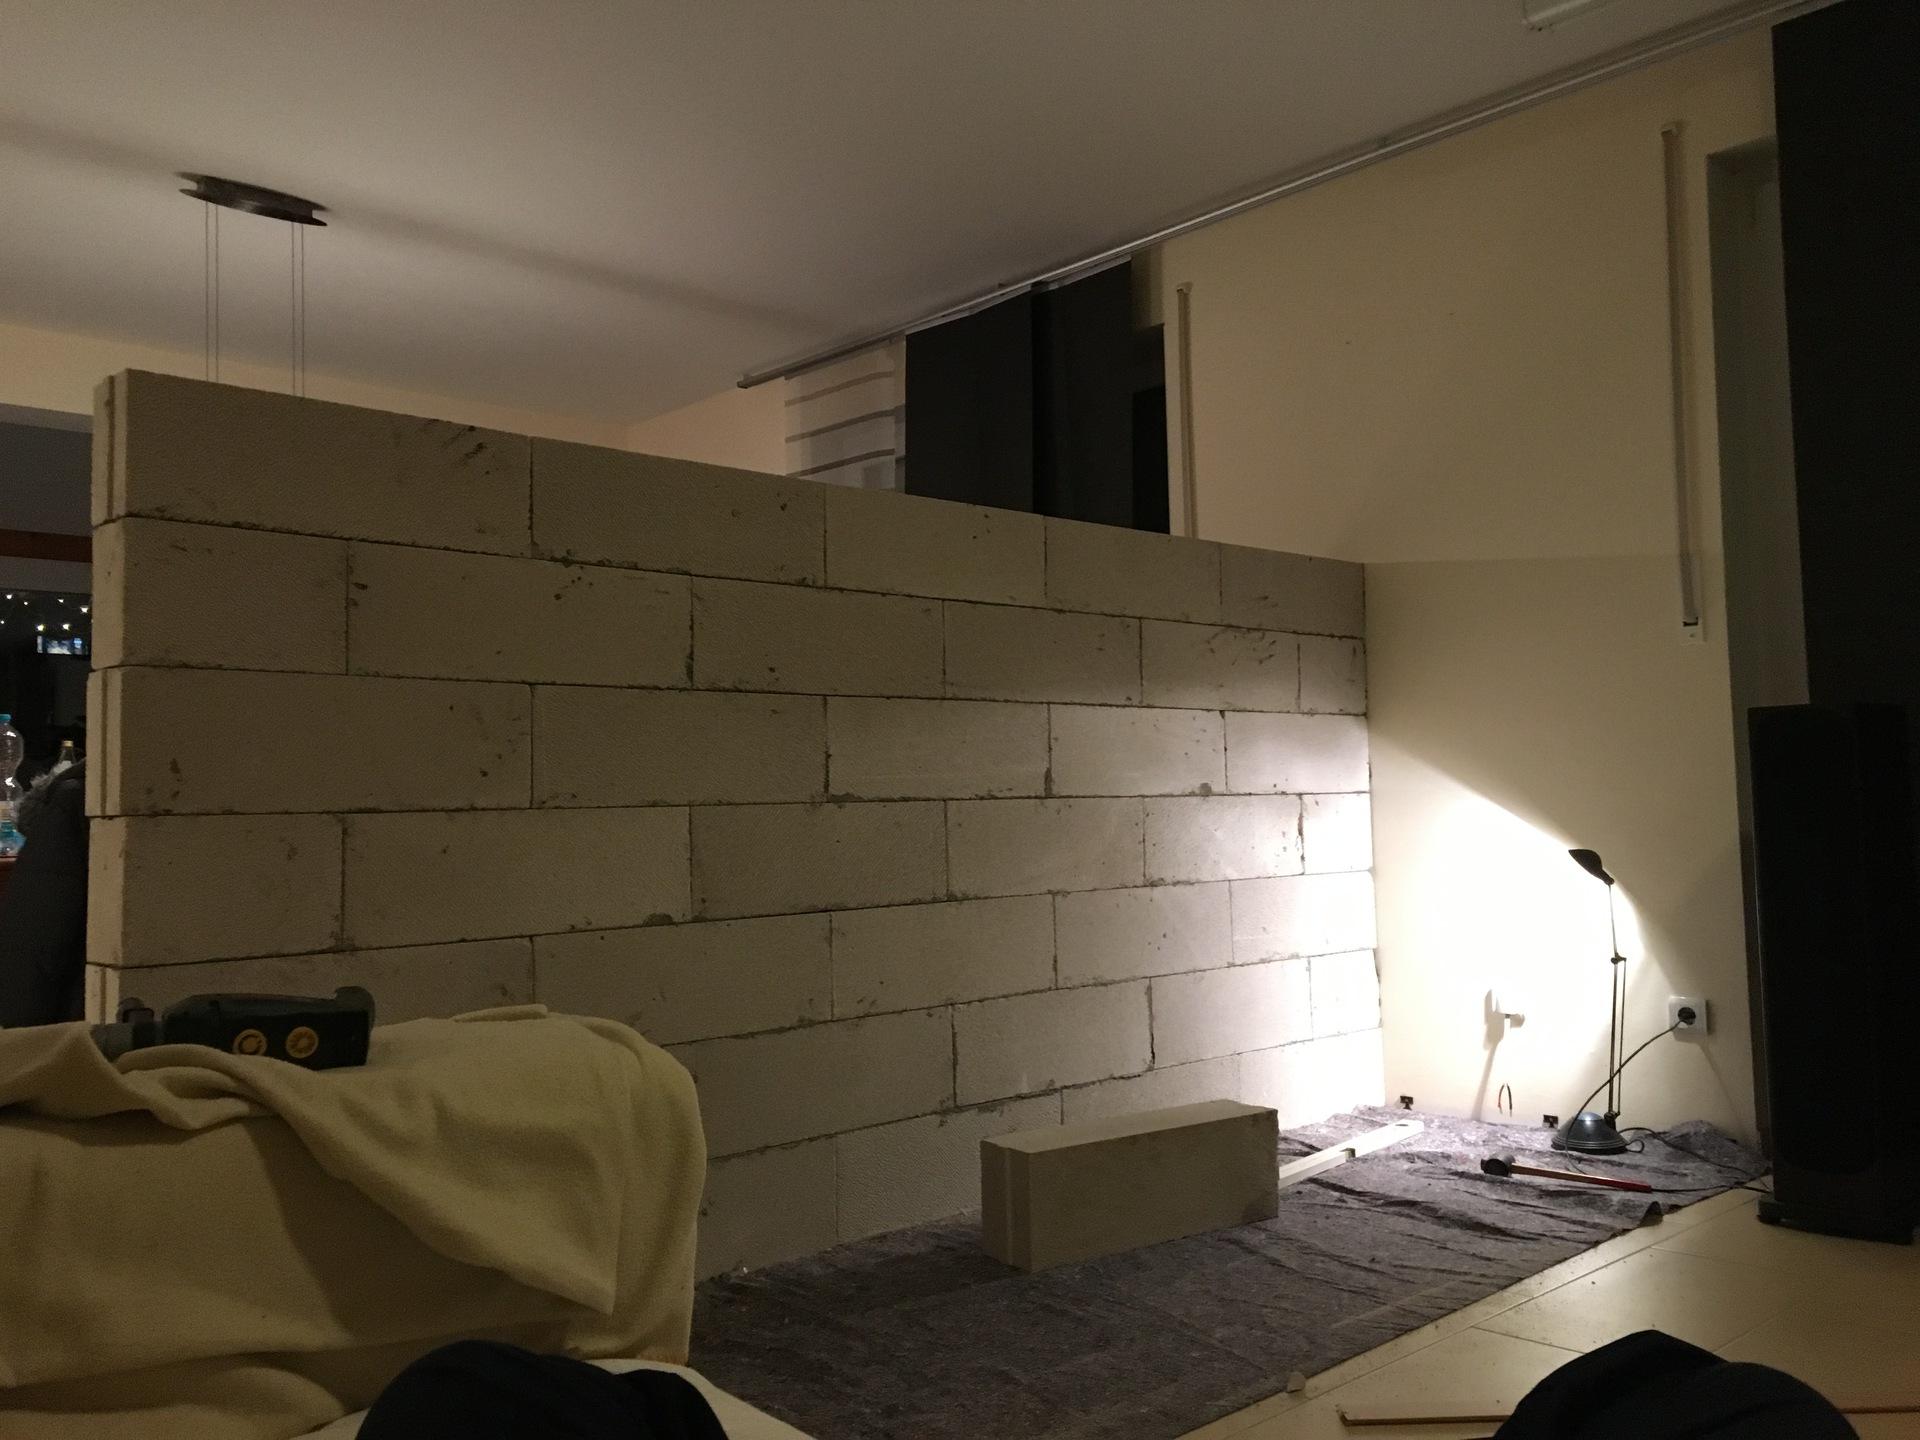 tv wand doityourself hifiwand laminatwand tvwand ytong hifi bildergalerie. Black Bedroom Furniture Sets. Home Design Ideas